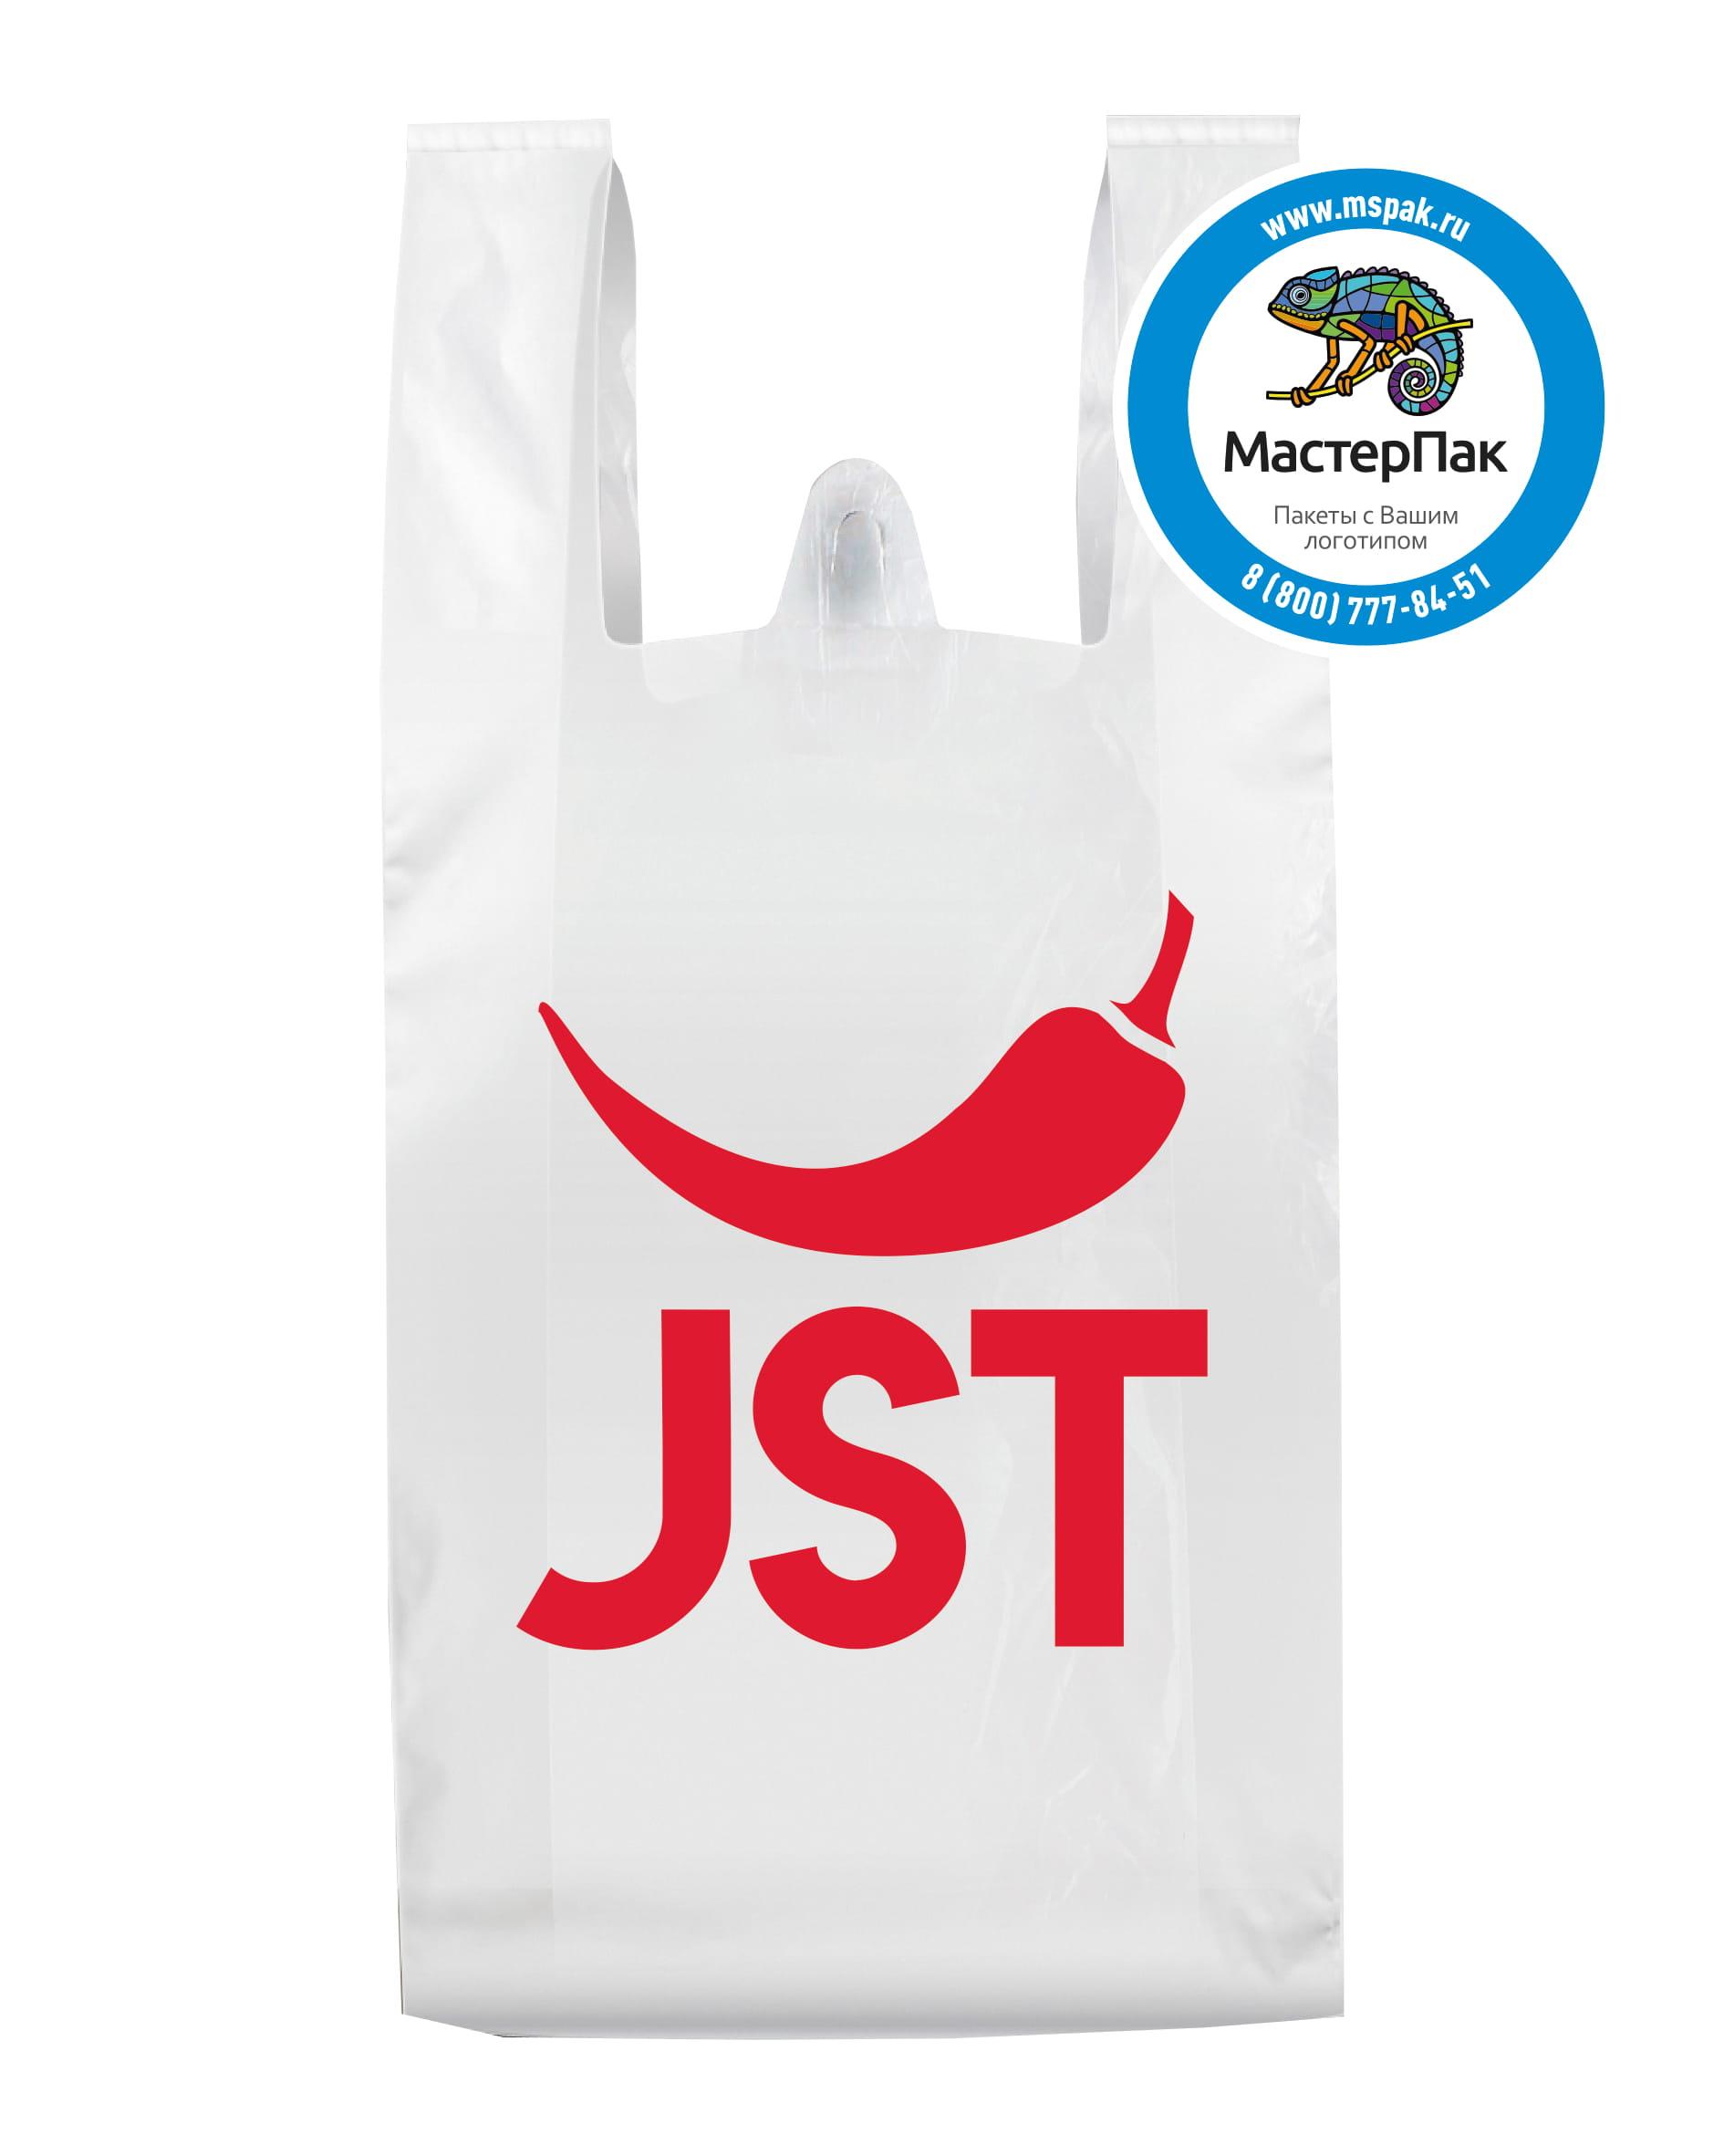 Пакет-майка ПВД с логотипом JST, 30 мкм, 40*60, белый